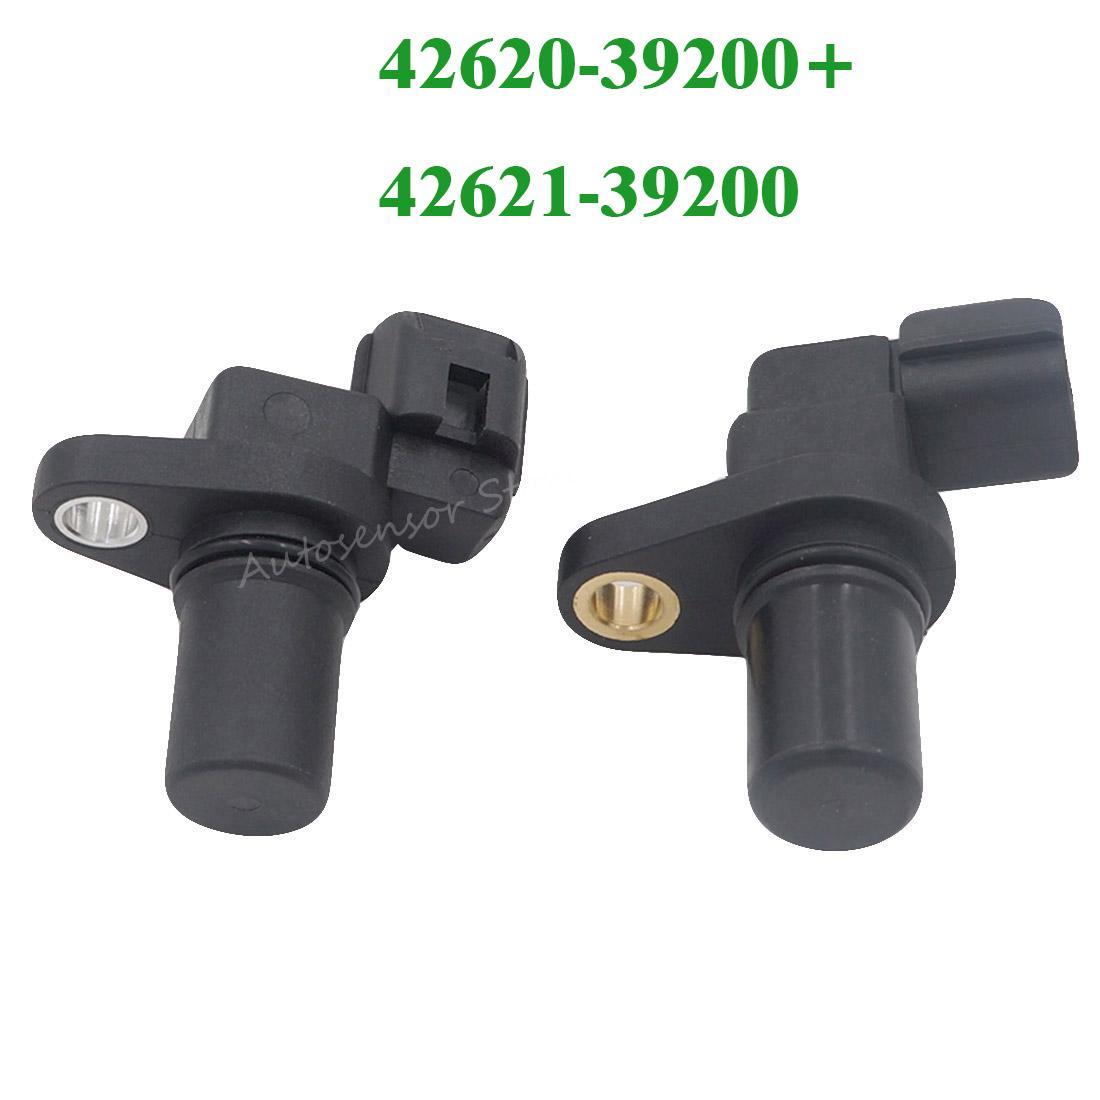 2002 Ford Taurus Crankshaft Position Sensor Diagram In Addition 2014